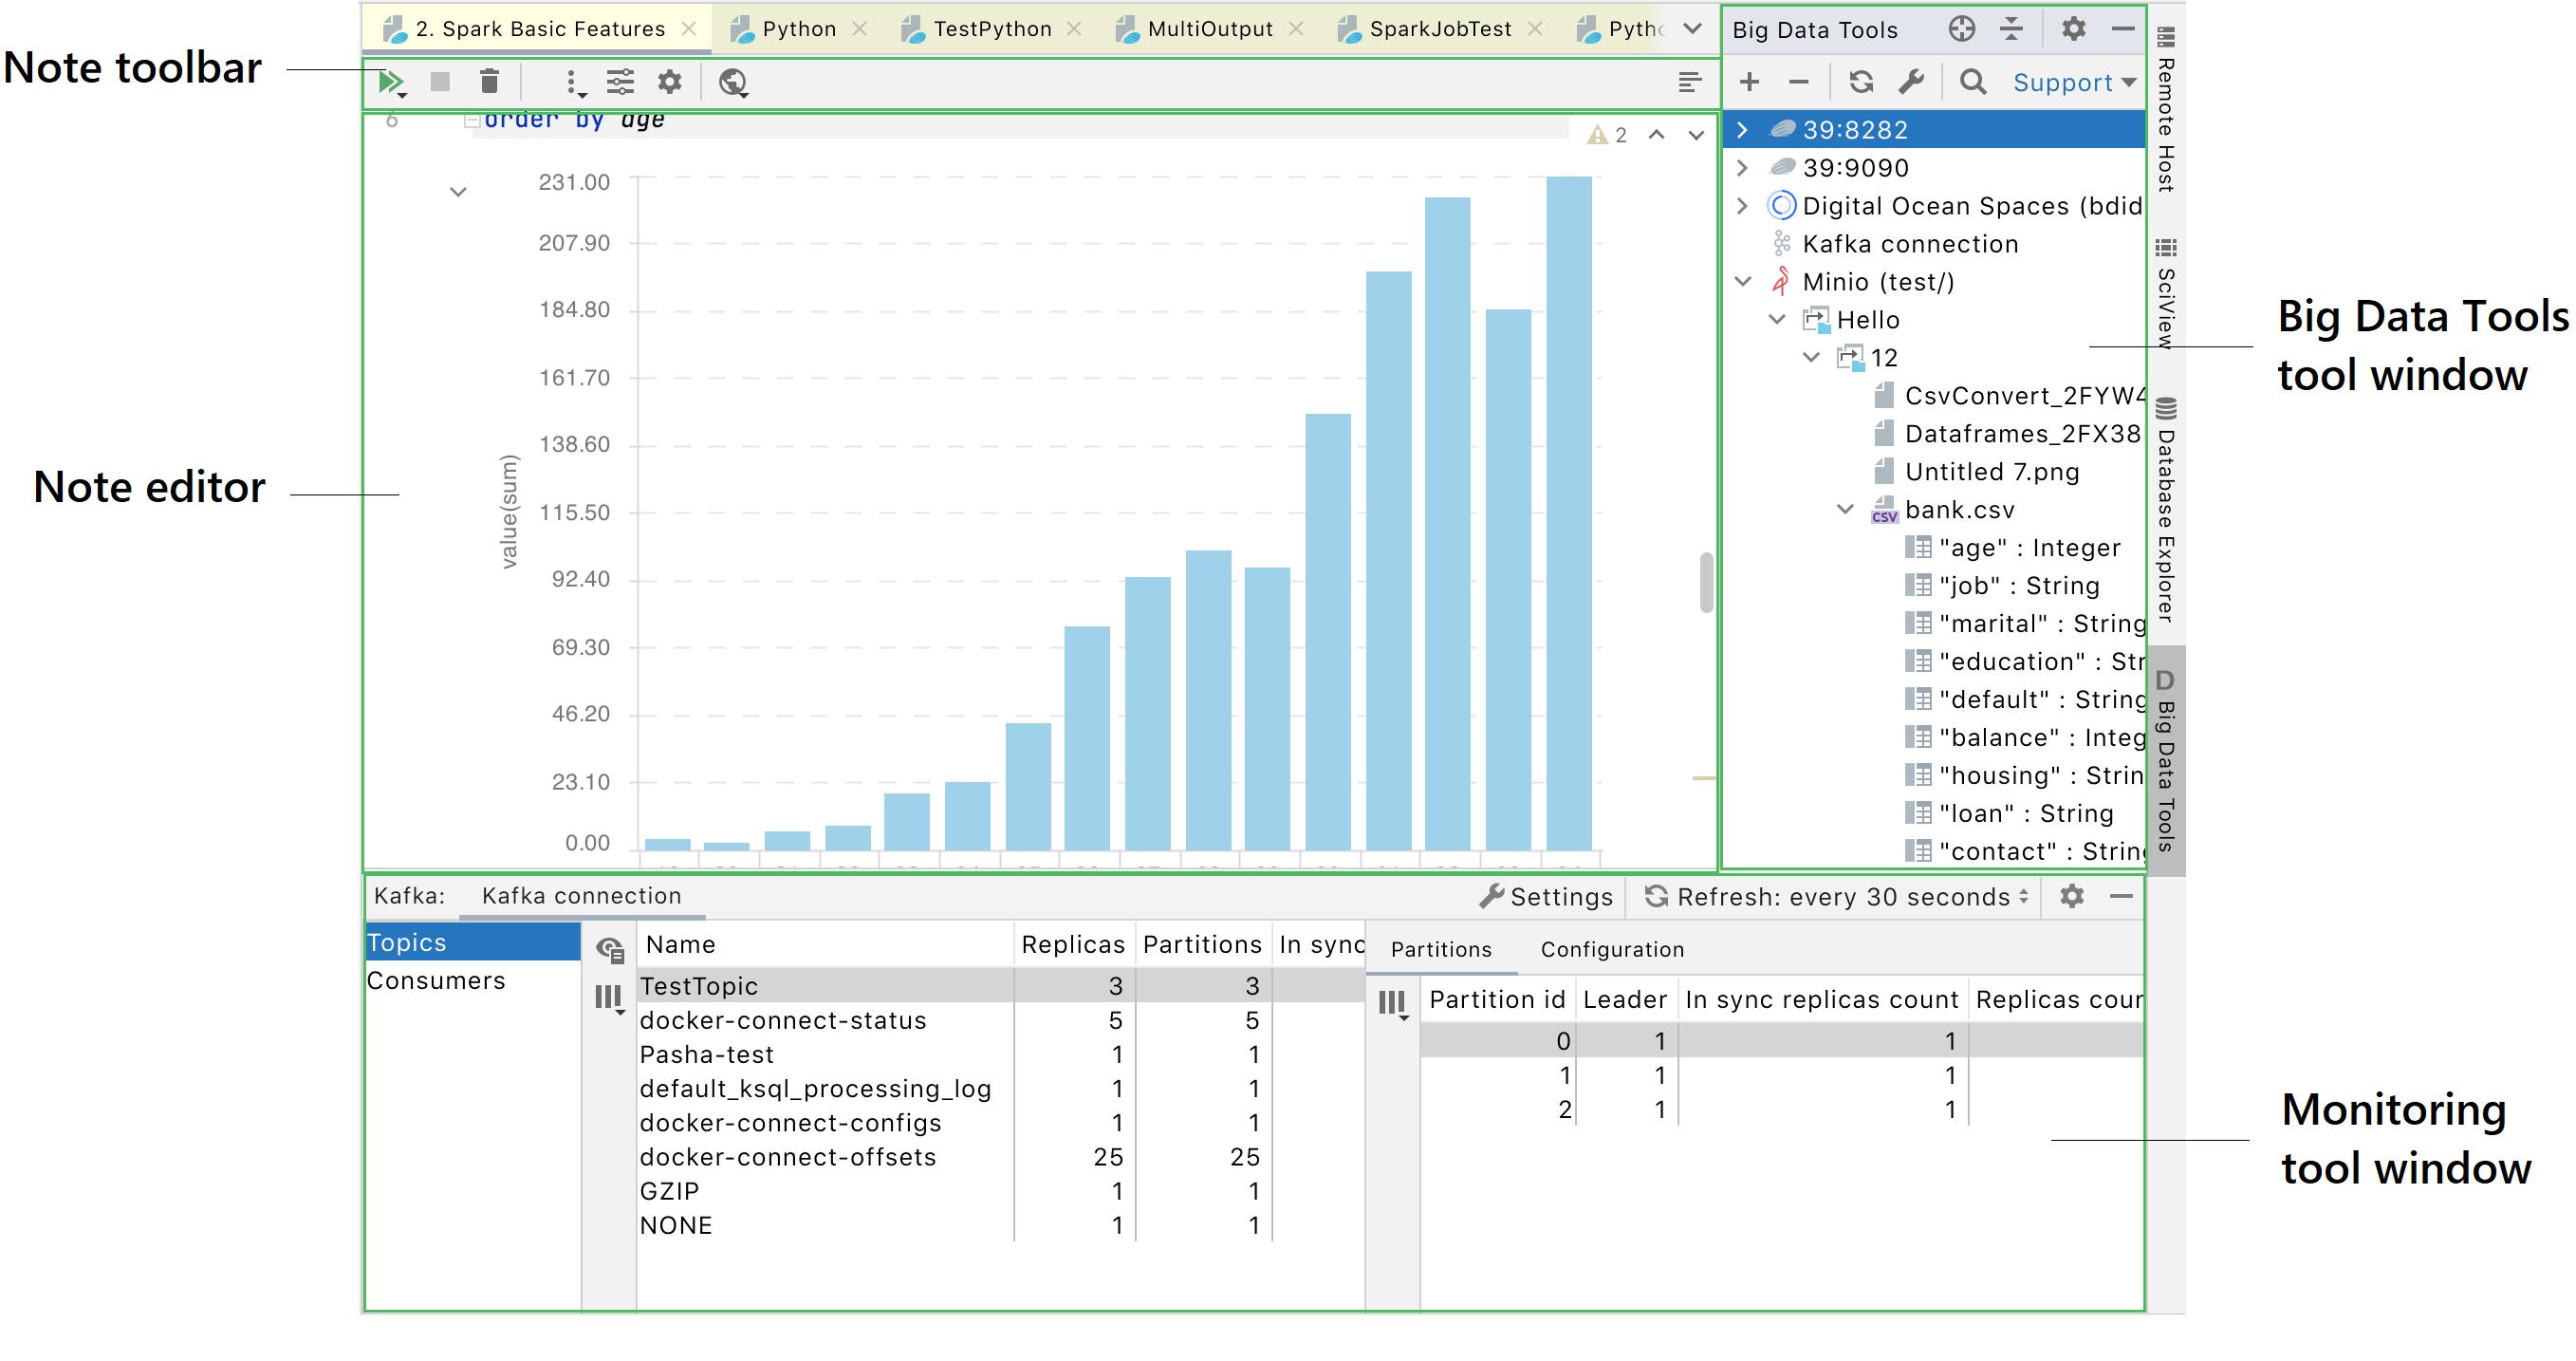 Big data tools UI overview